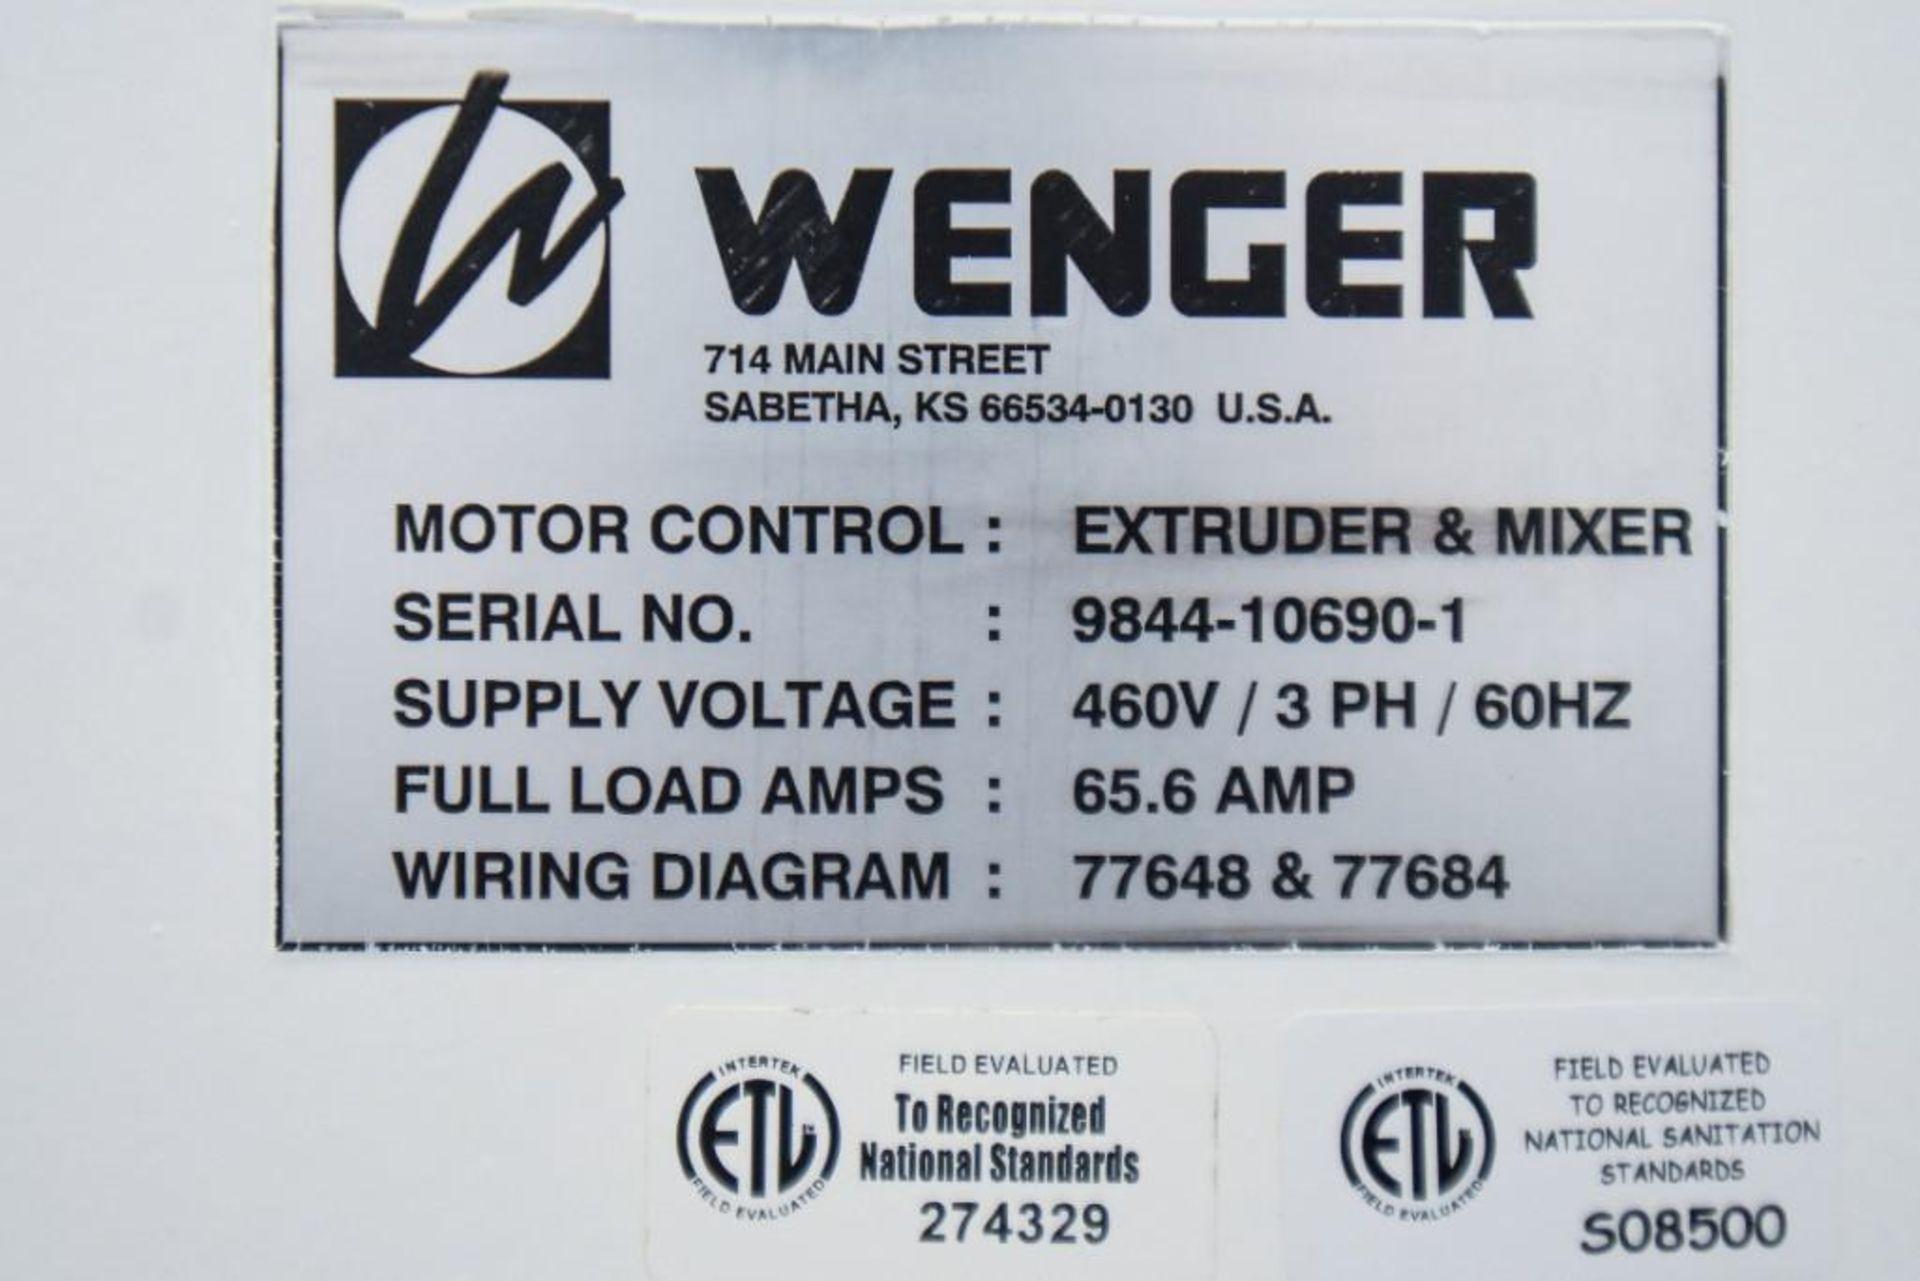 Wenger Mixer - Alanco Silo - Wenger Extruder - Image 8 of 31